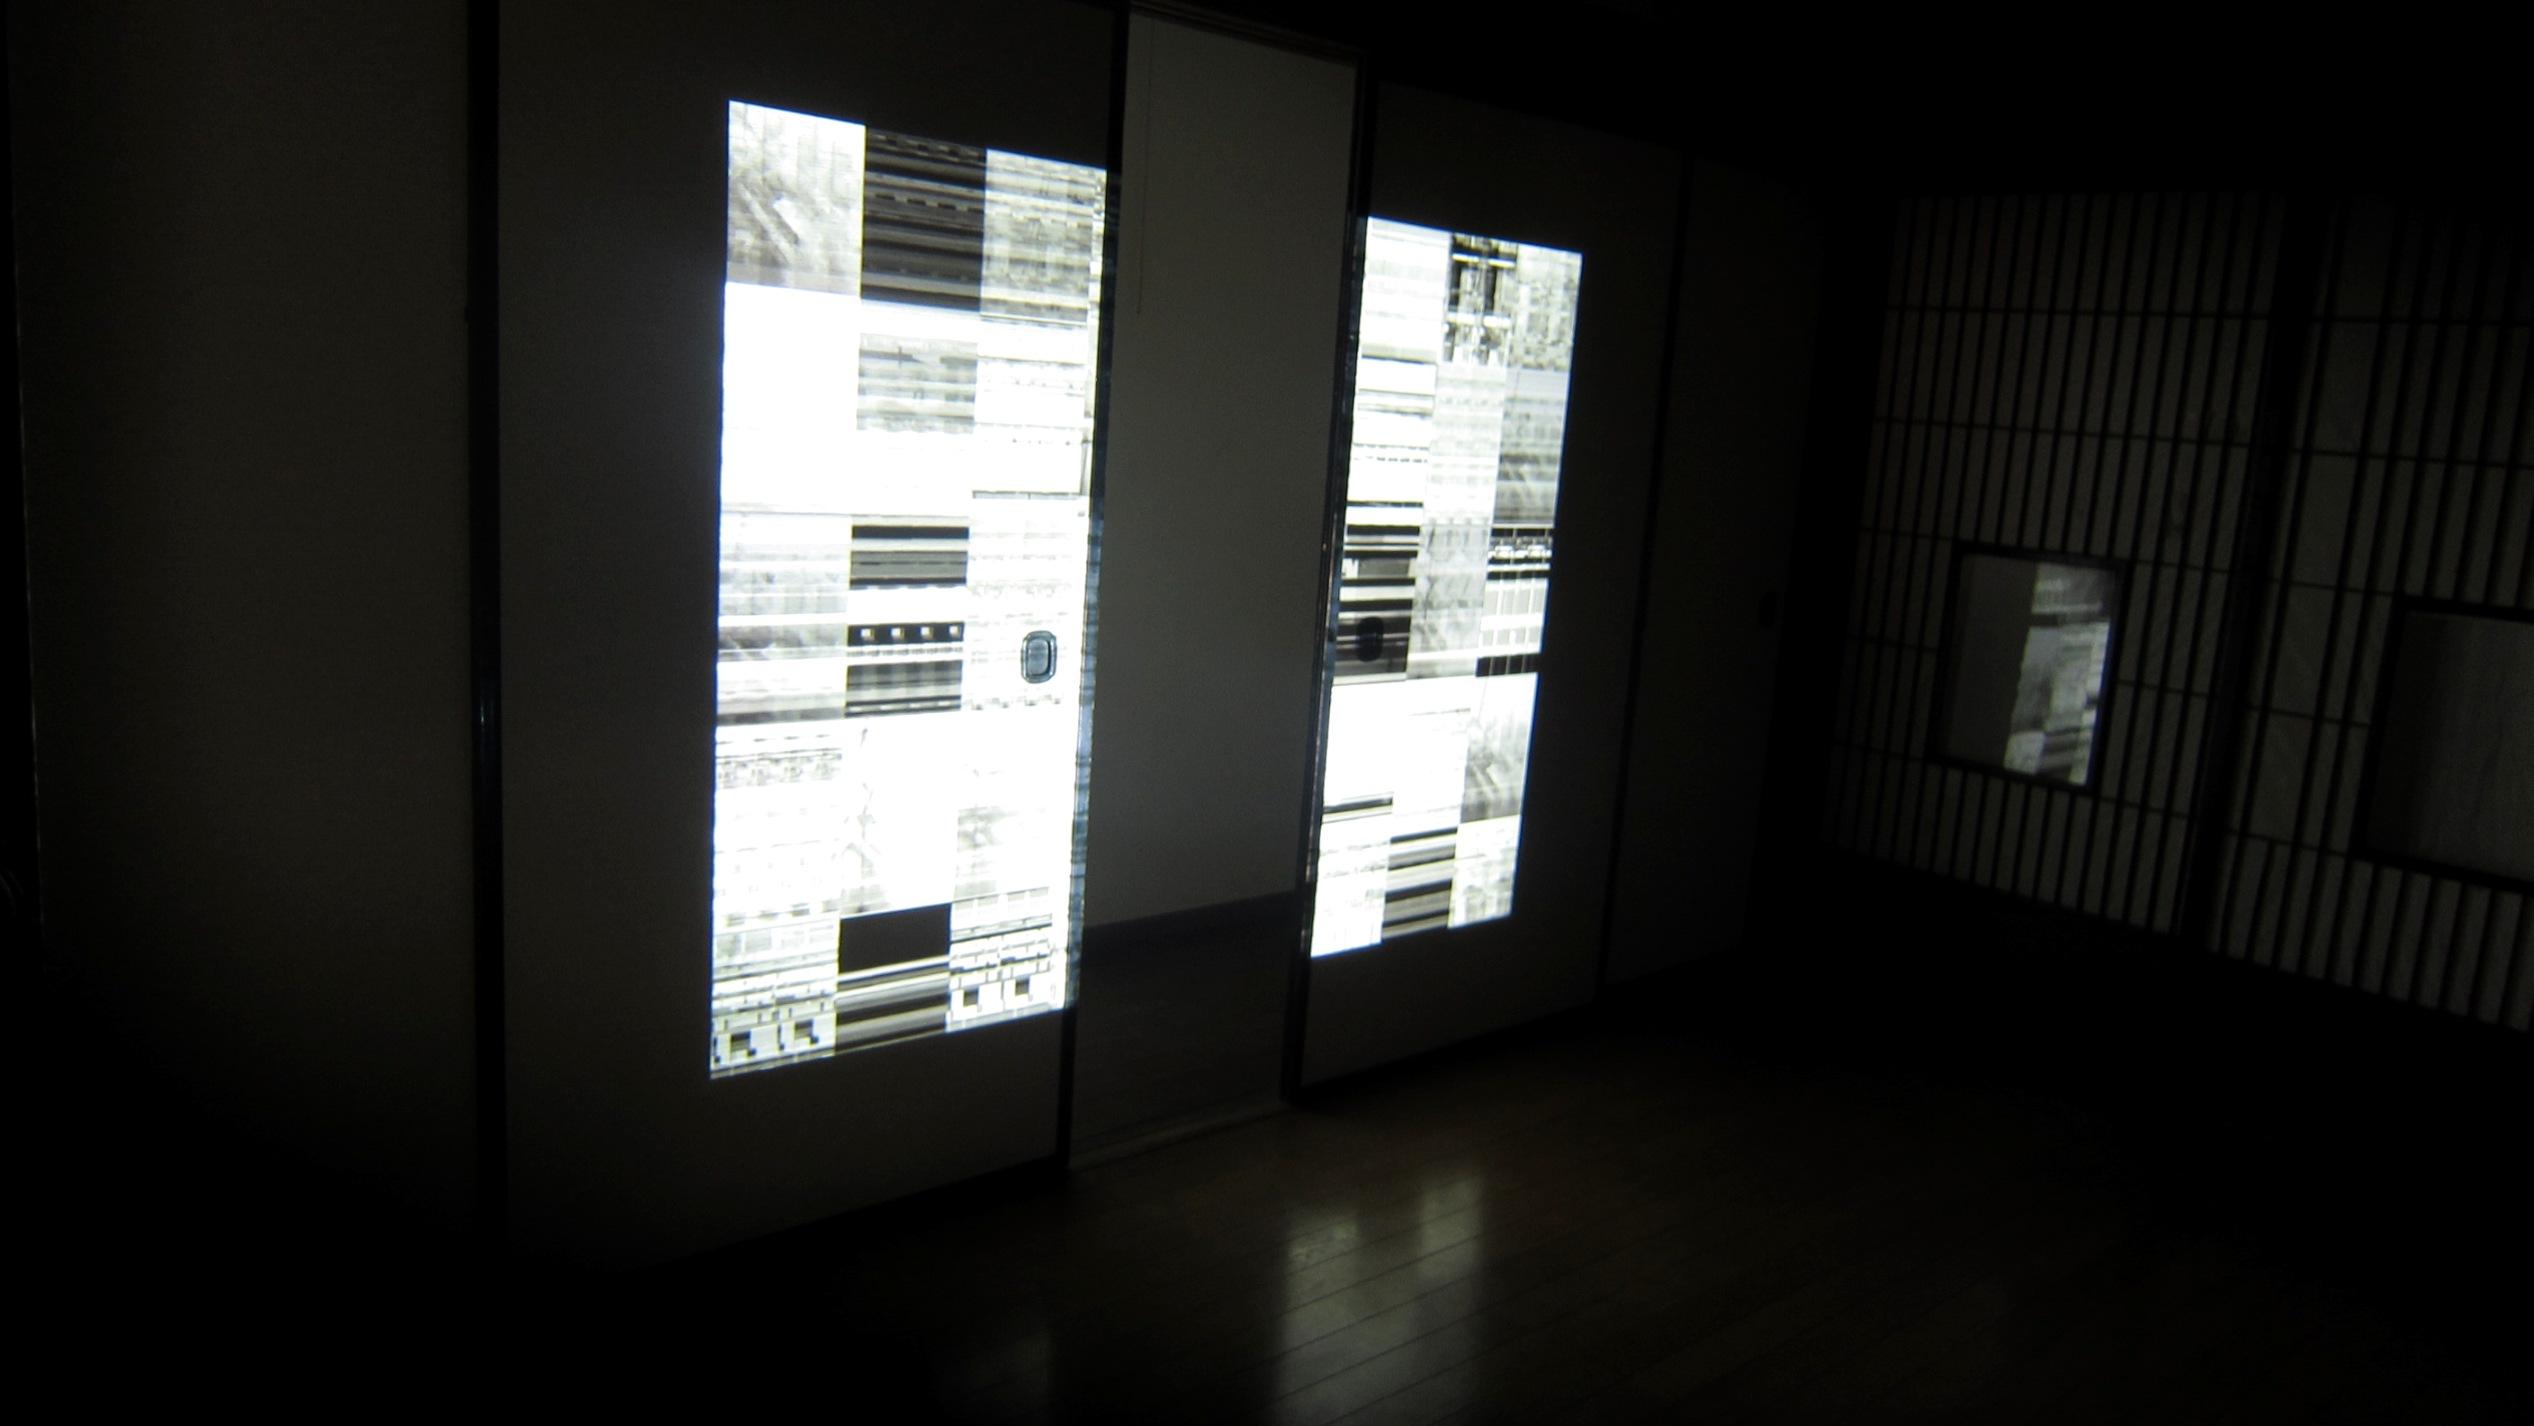 2035)「上野麗市 個展 『De\'tente デタント』」 g.犬養 4月17日(水)~4月29日(月)_f0126829_8544018.jpg